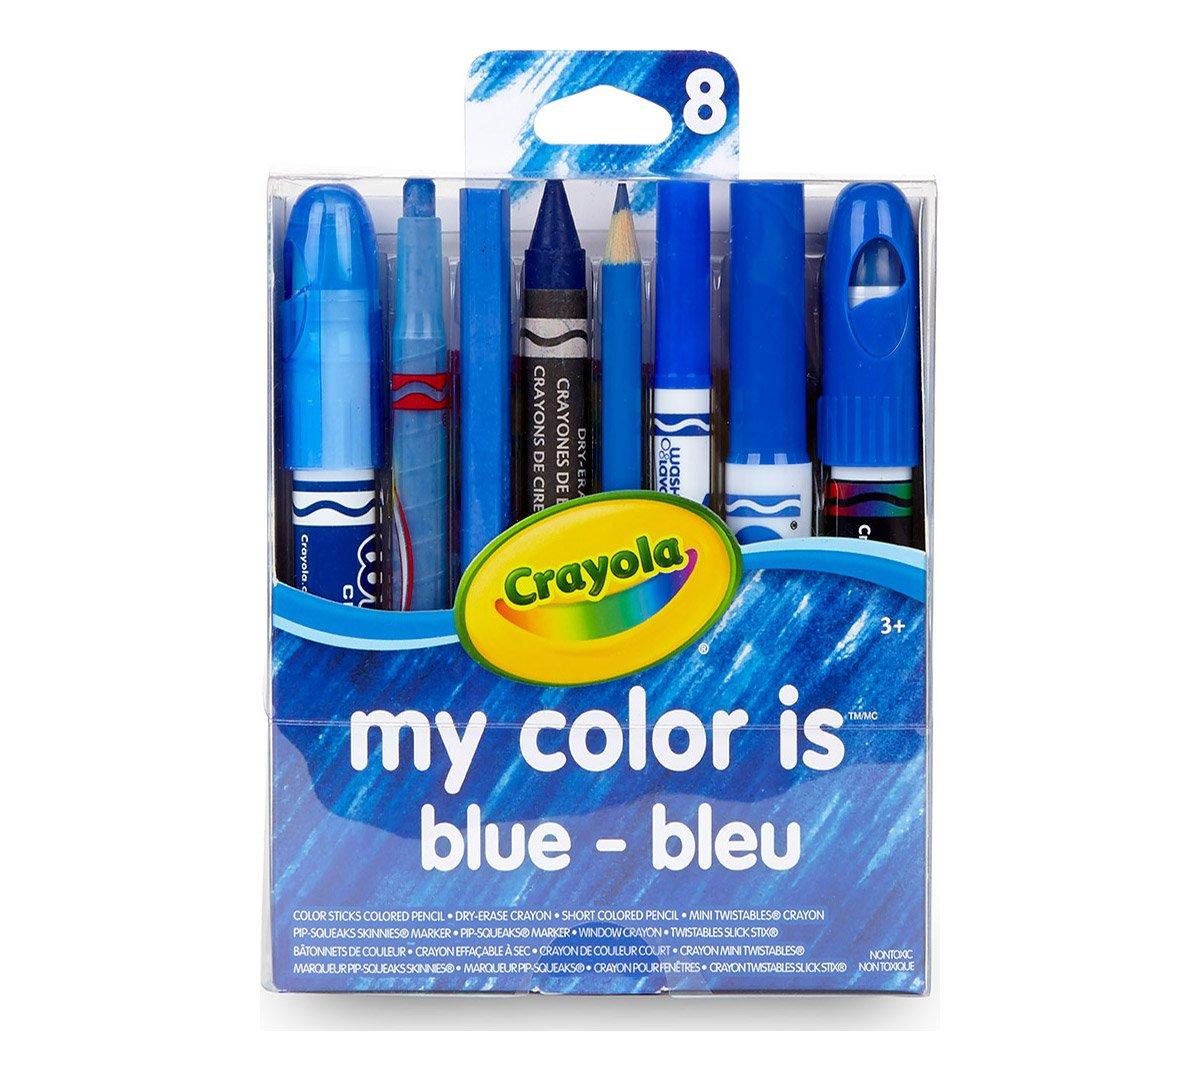 Crayola My Color is Green